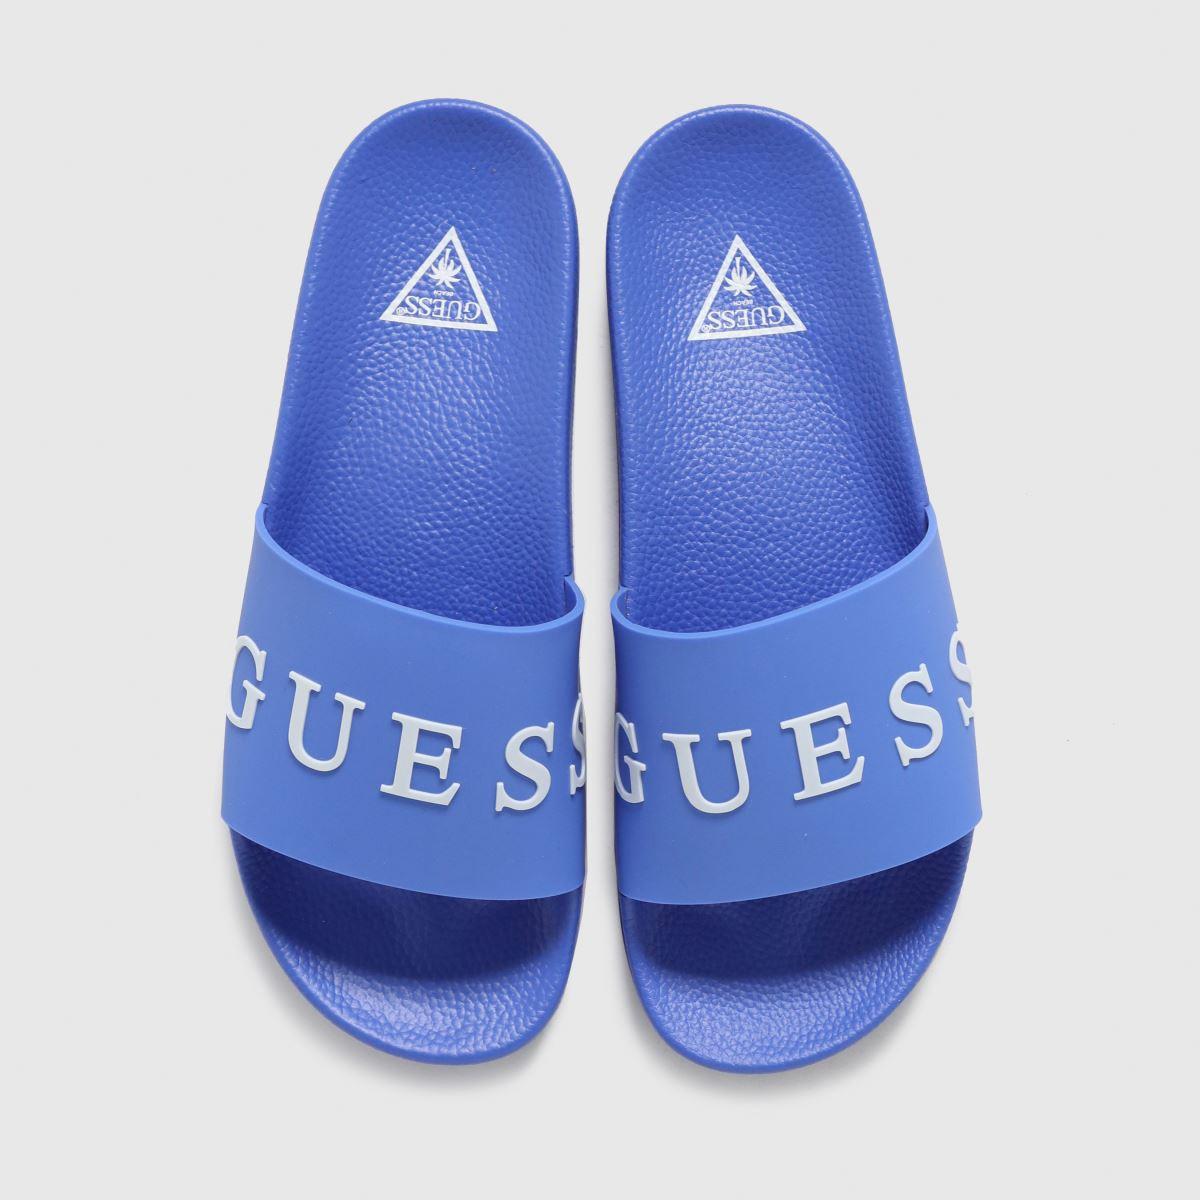 GUESS Blue Logo Slide Sandals